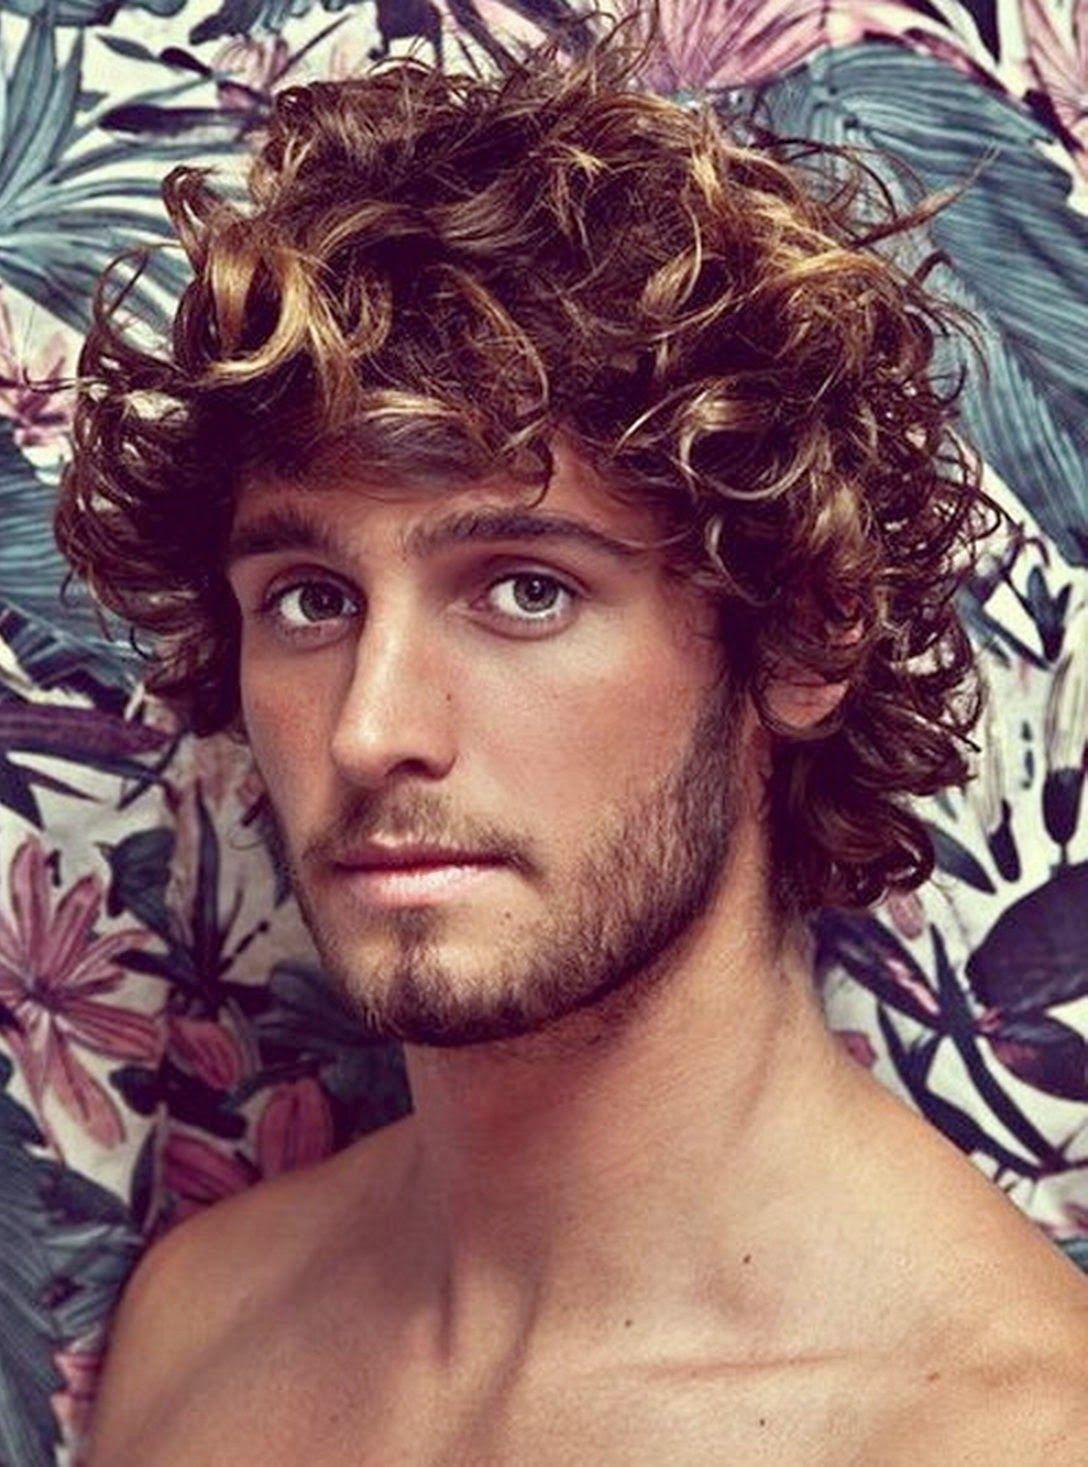 Medium haircuts for men with thick hair corte mediopelo rizadohombre  men  gods  erotica   pinterest